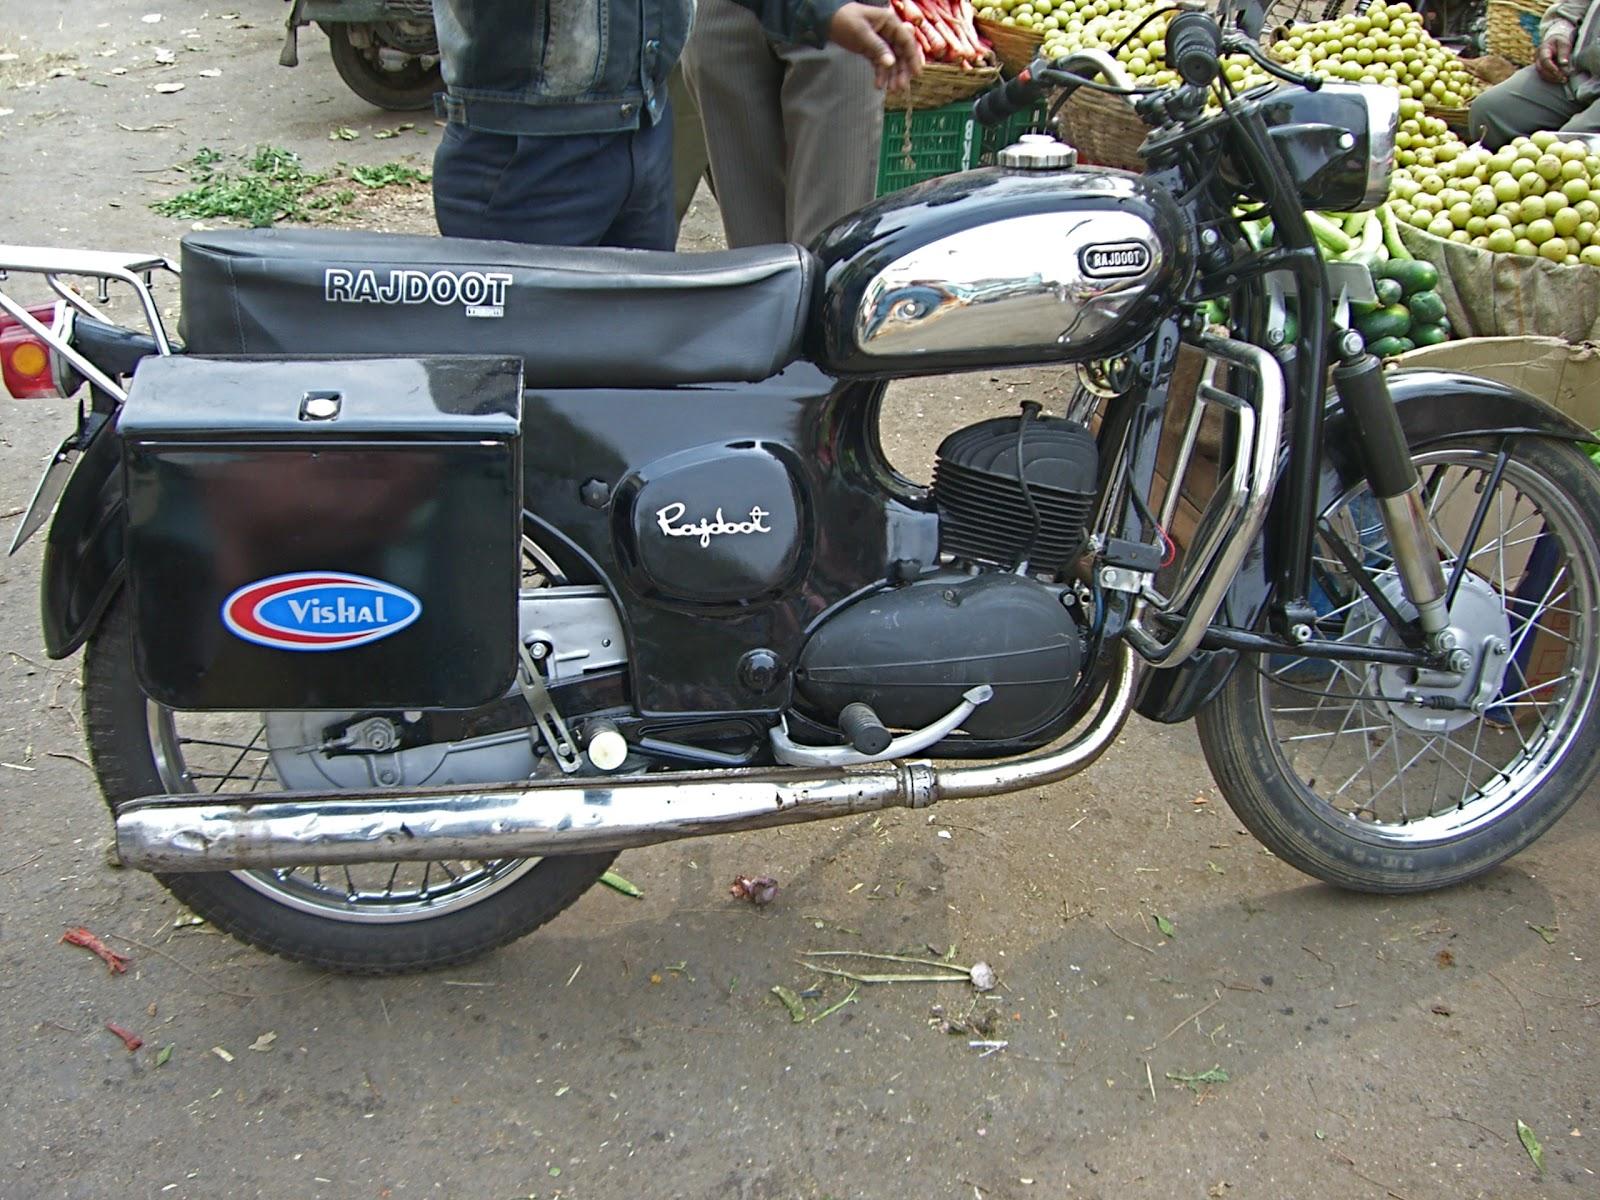 Rajdoot Motorcycle